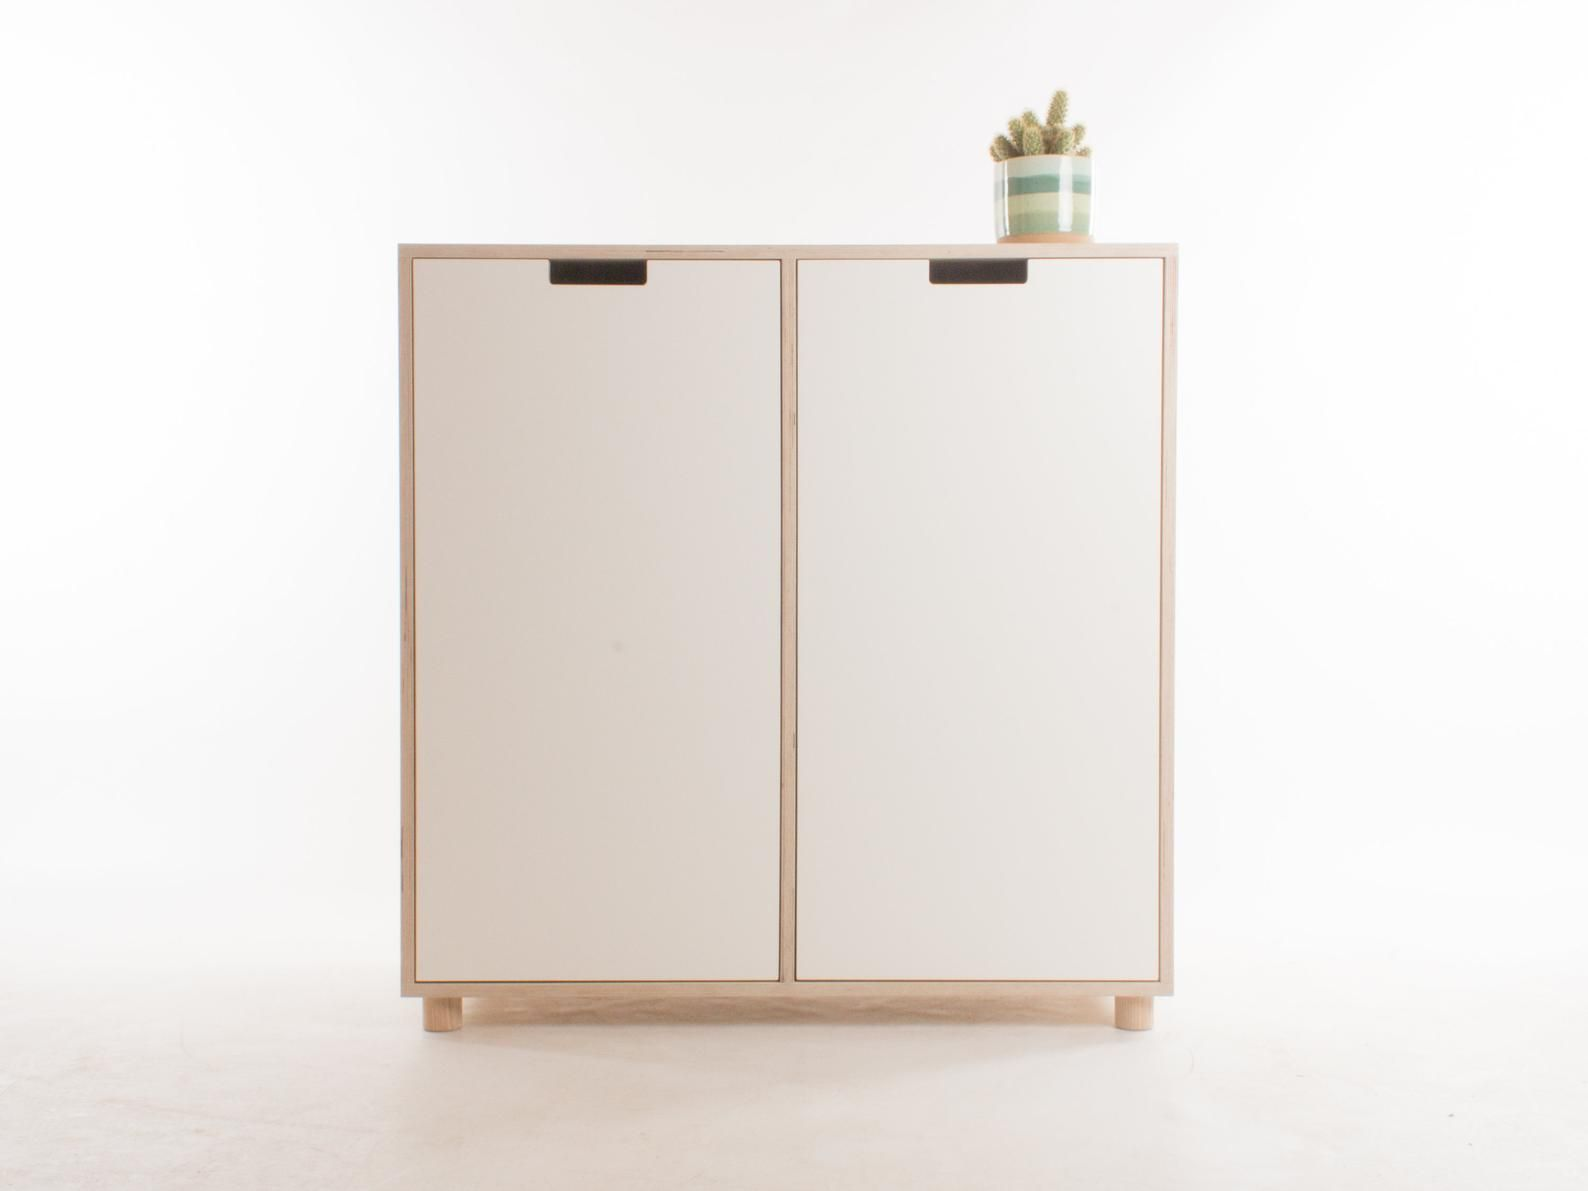 Oslo Hohe Sideboard Schrank Credenza Etsy Tall Sideboard Cupboard Storage Tall Sideboard Cabinet